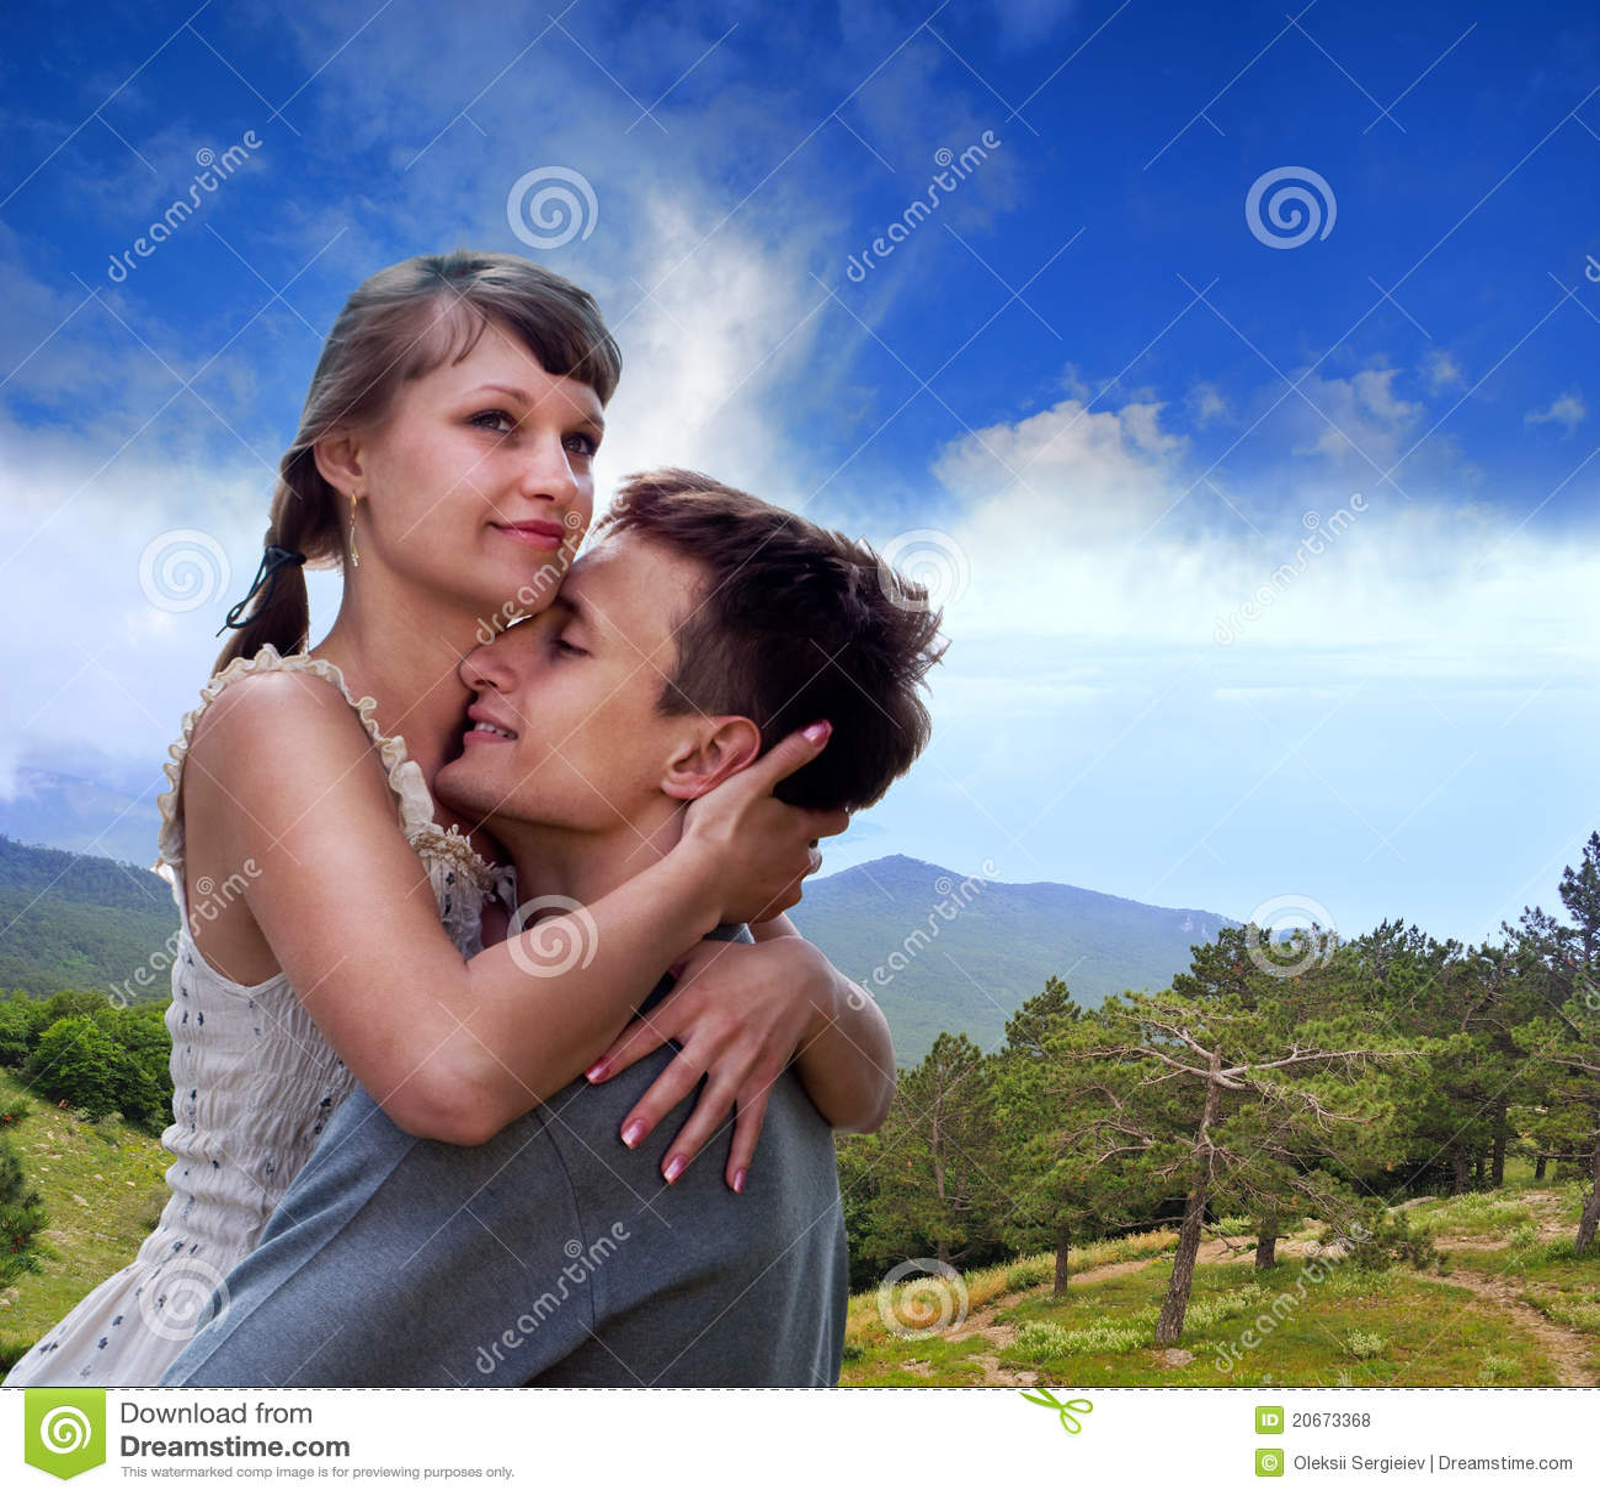 Portrait of love in nature